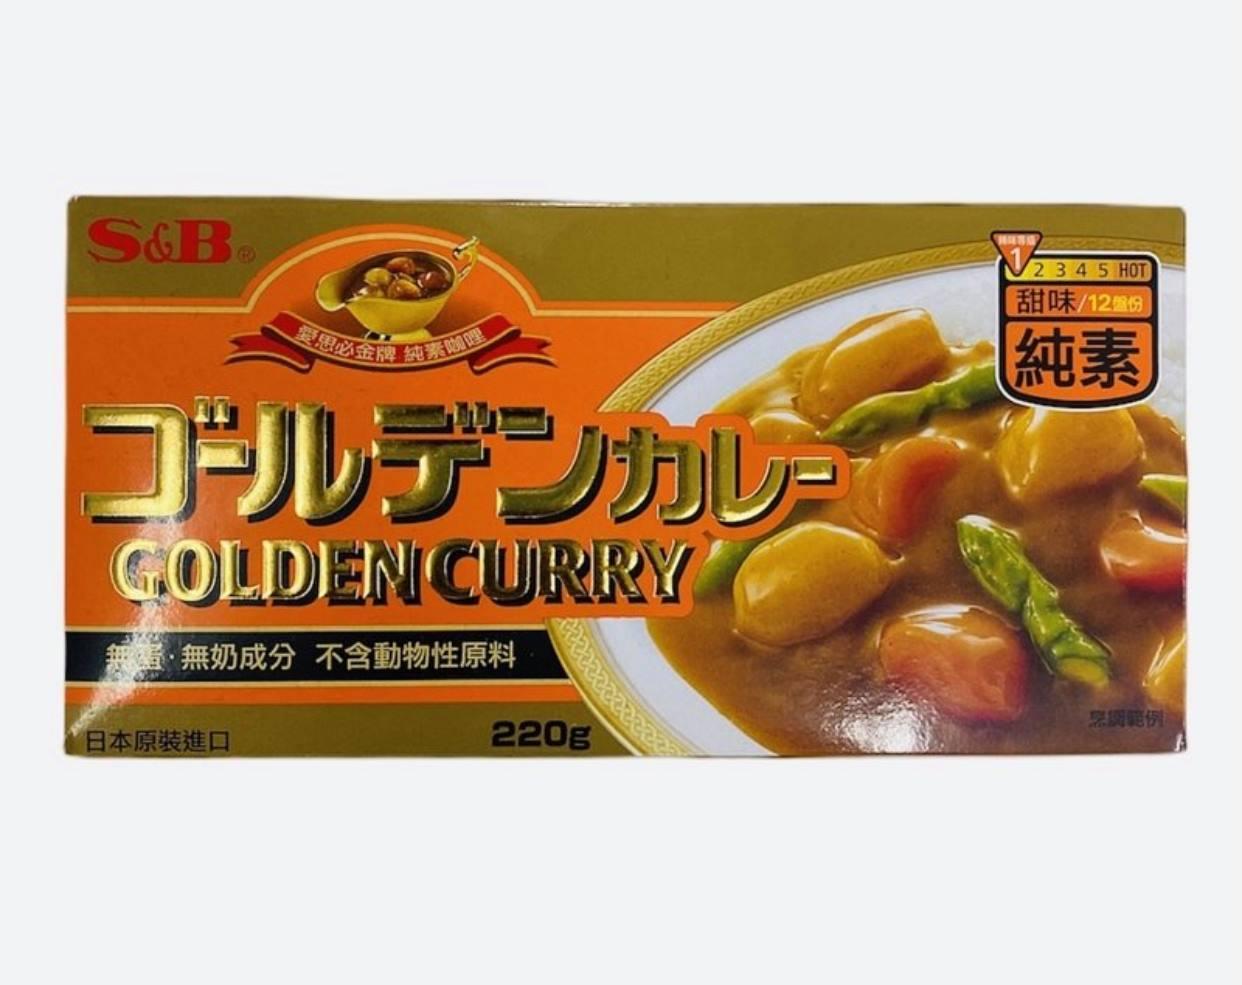 S&B愛思必 純素黃金咖哩-甜味/中辣 220g